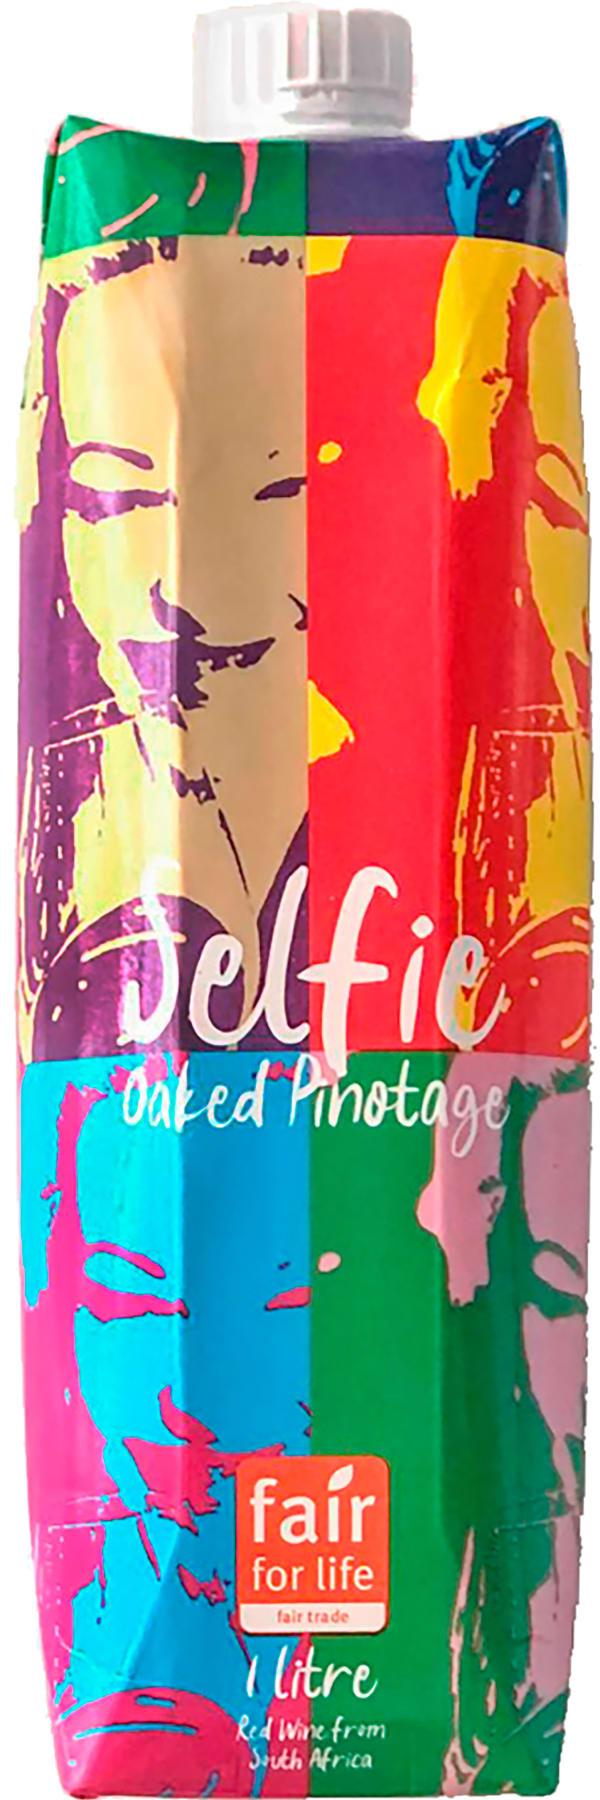 Selfie Oaked Pinotage 2020 kartongförpackning